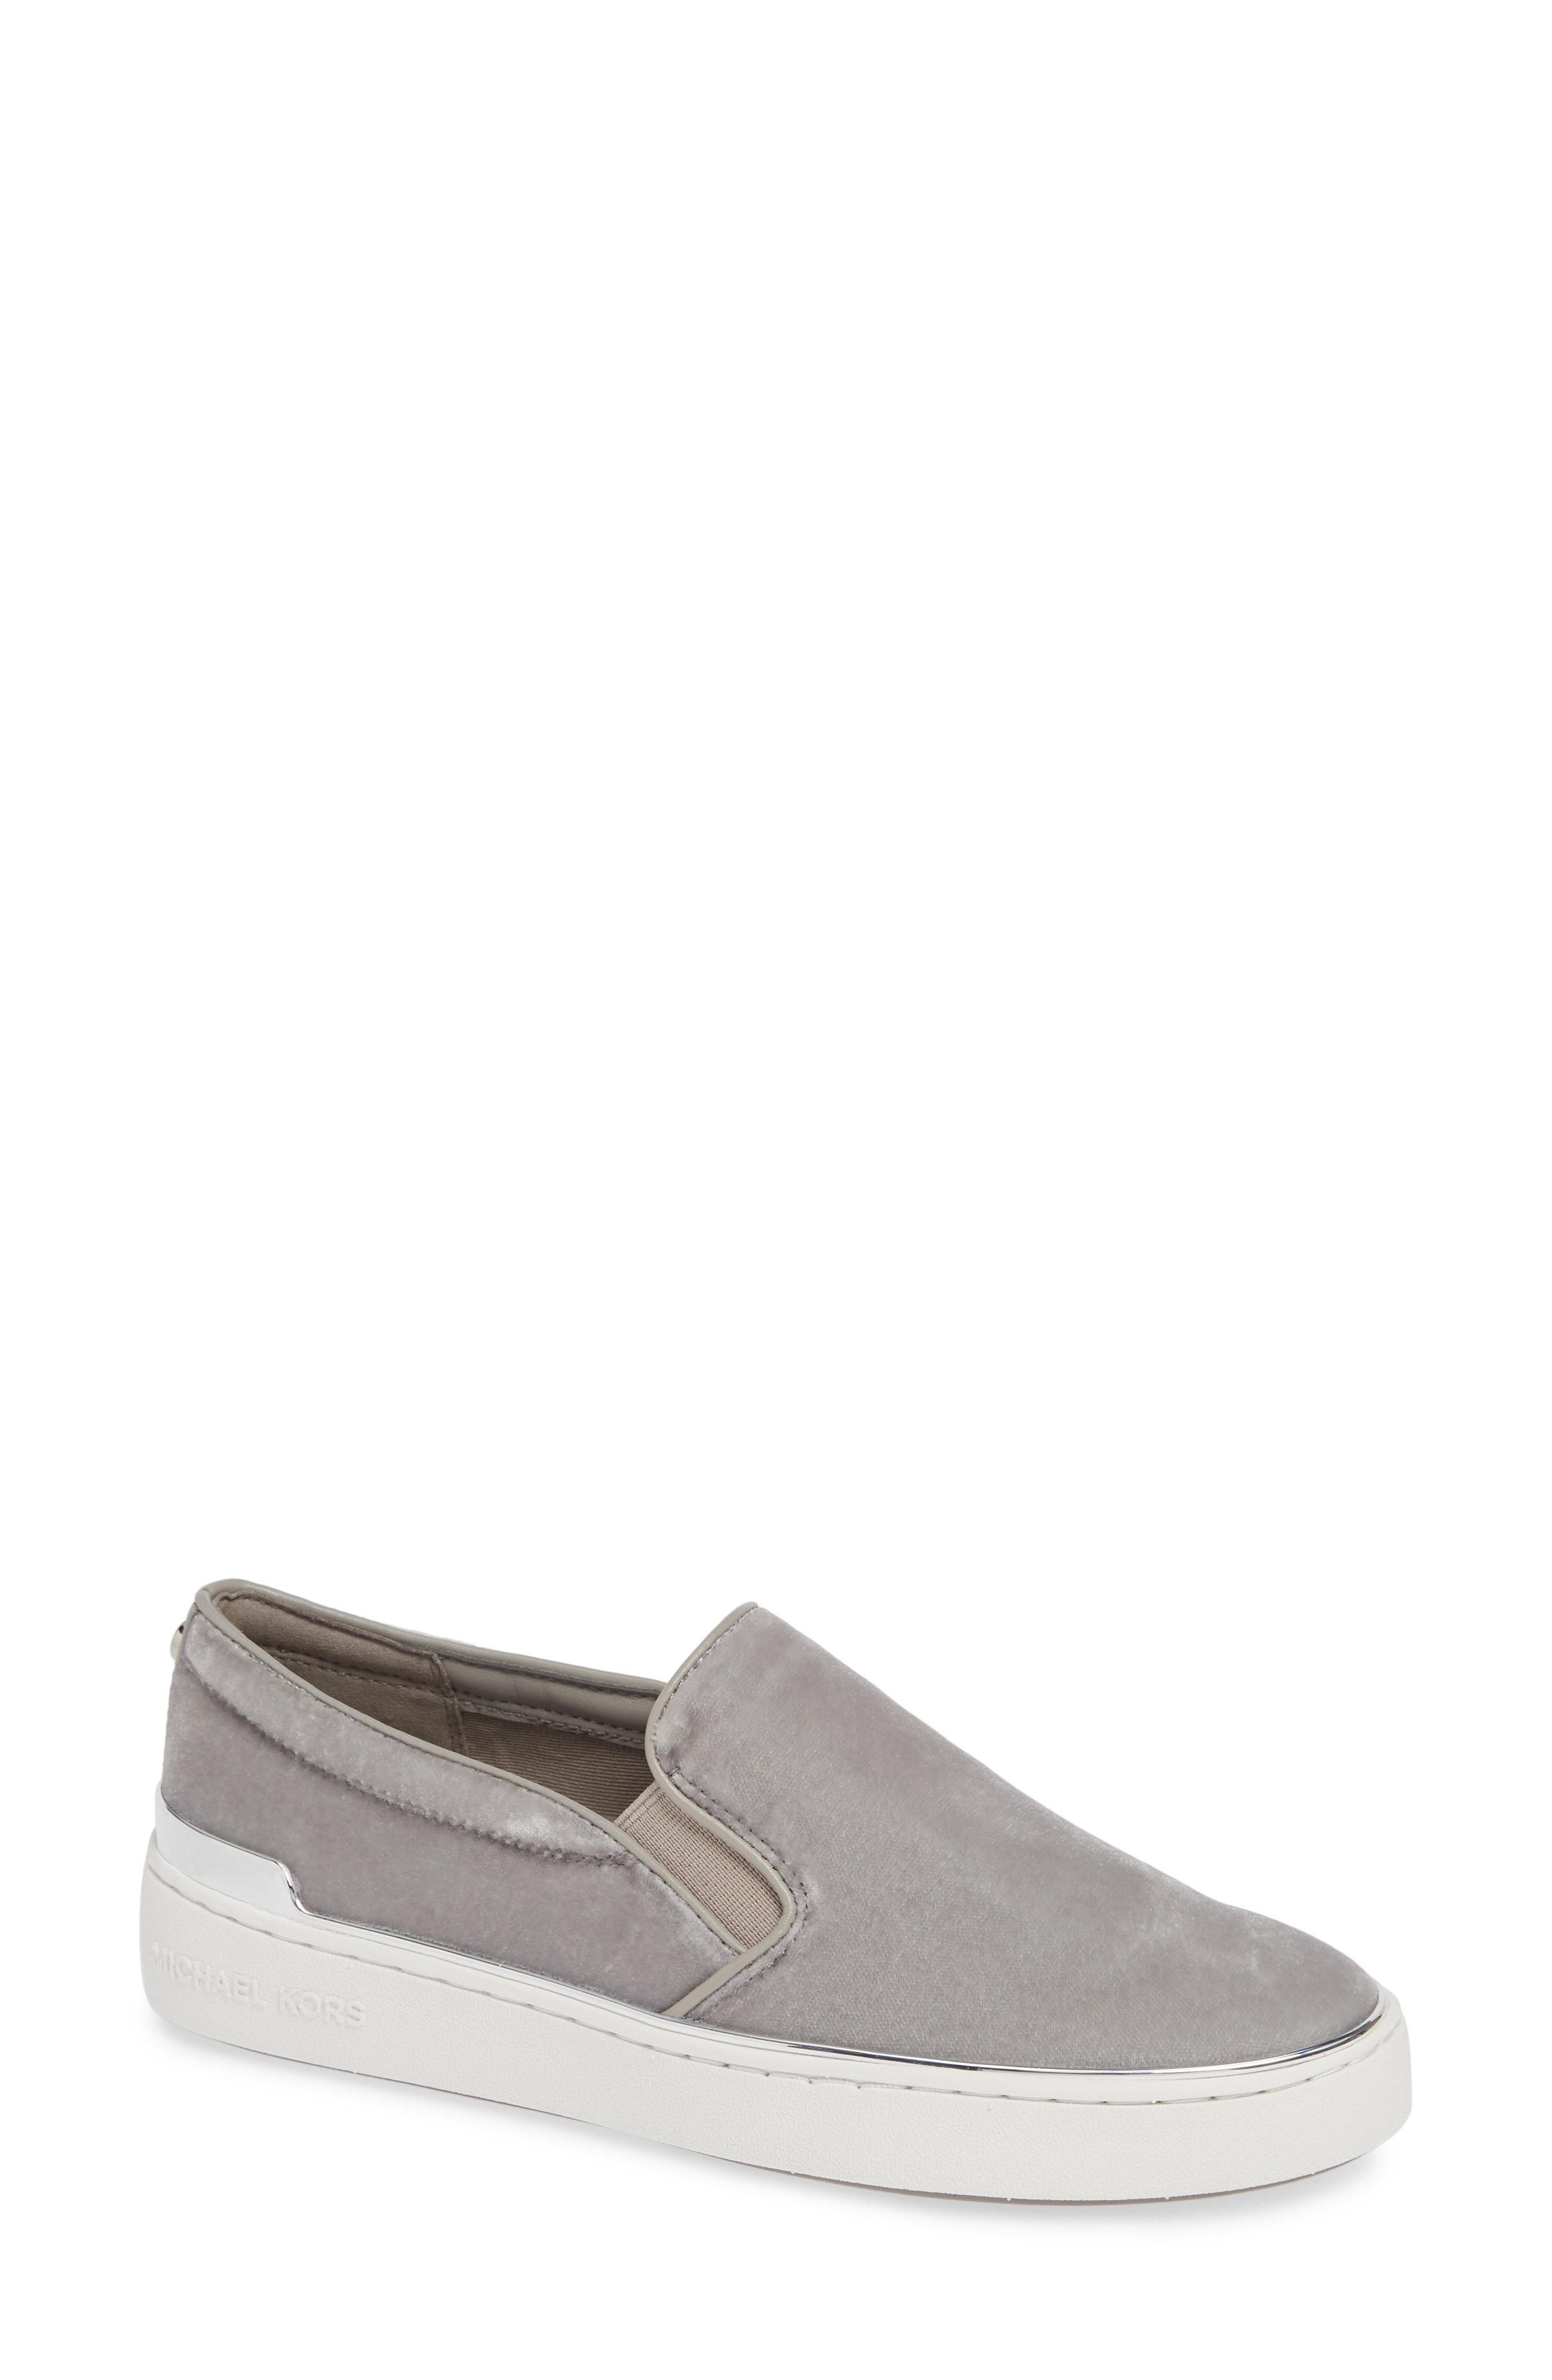 8052d0fa352fa Nordstrom Michael Kors Baby Shoes - Style Guru  Fashion